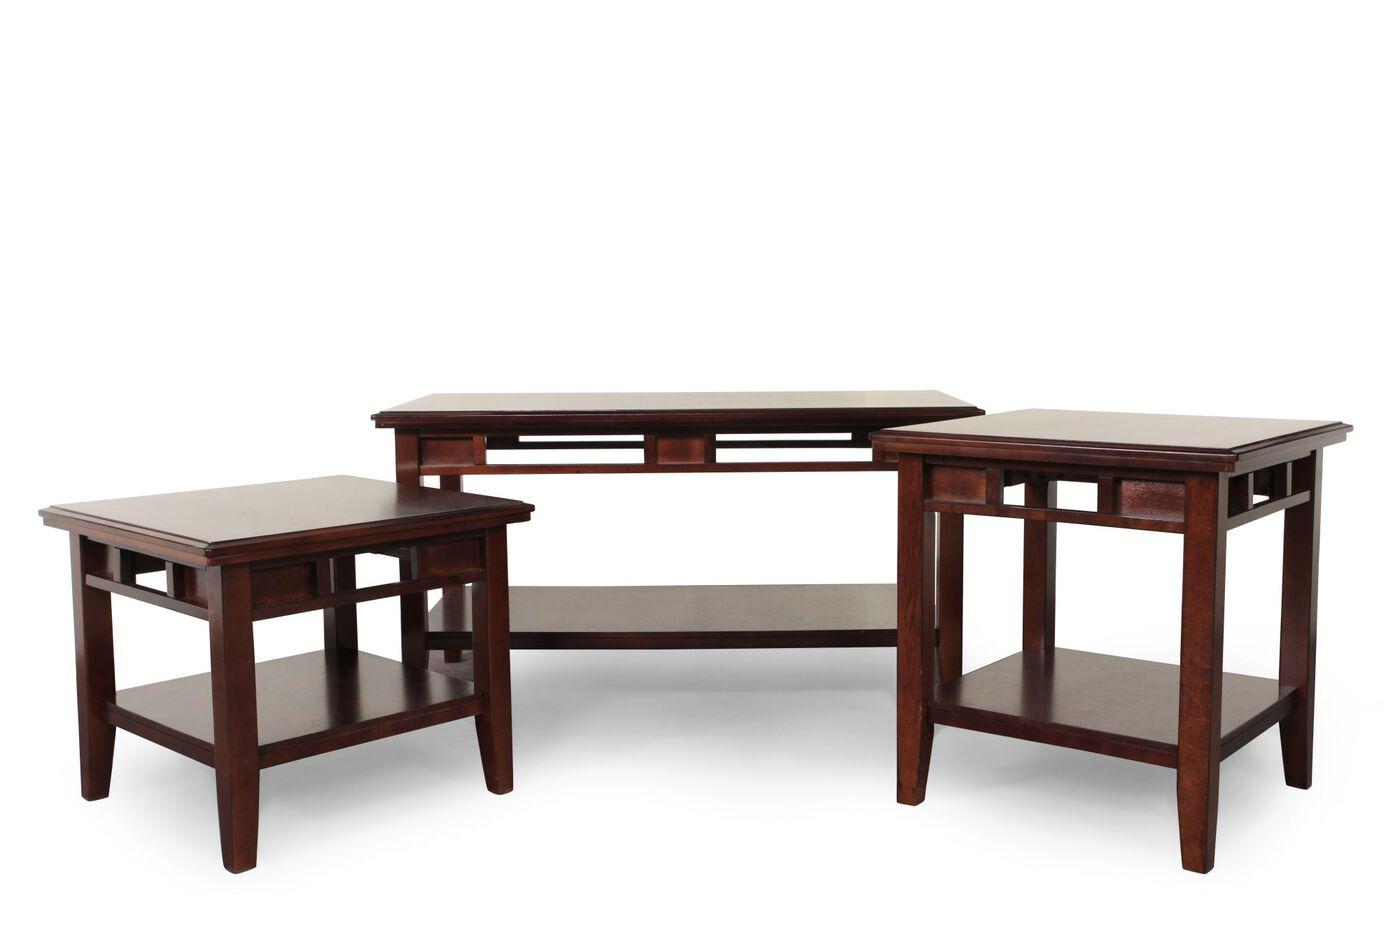 Three Piece Contemporary Coffee Table Set In Dark Brown